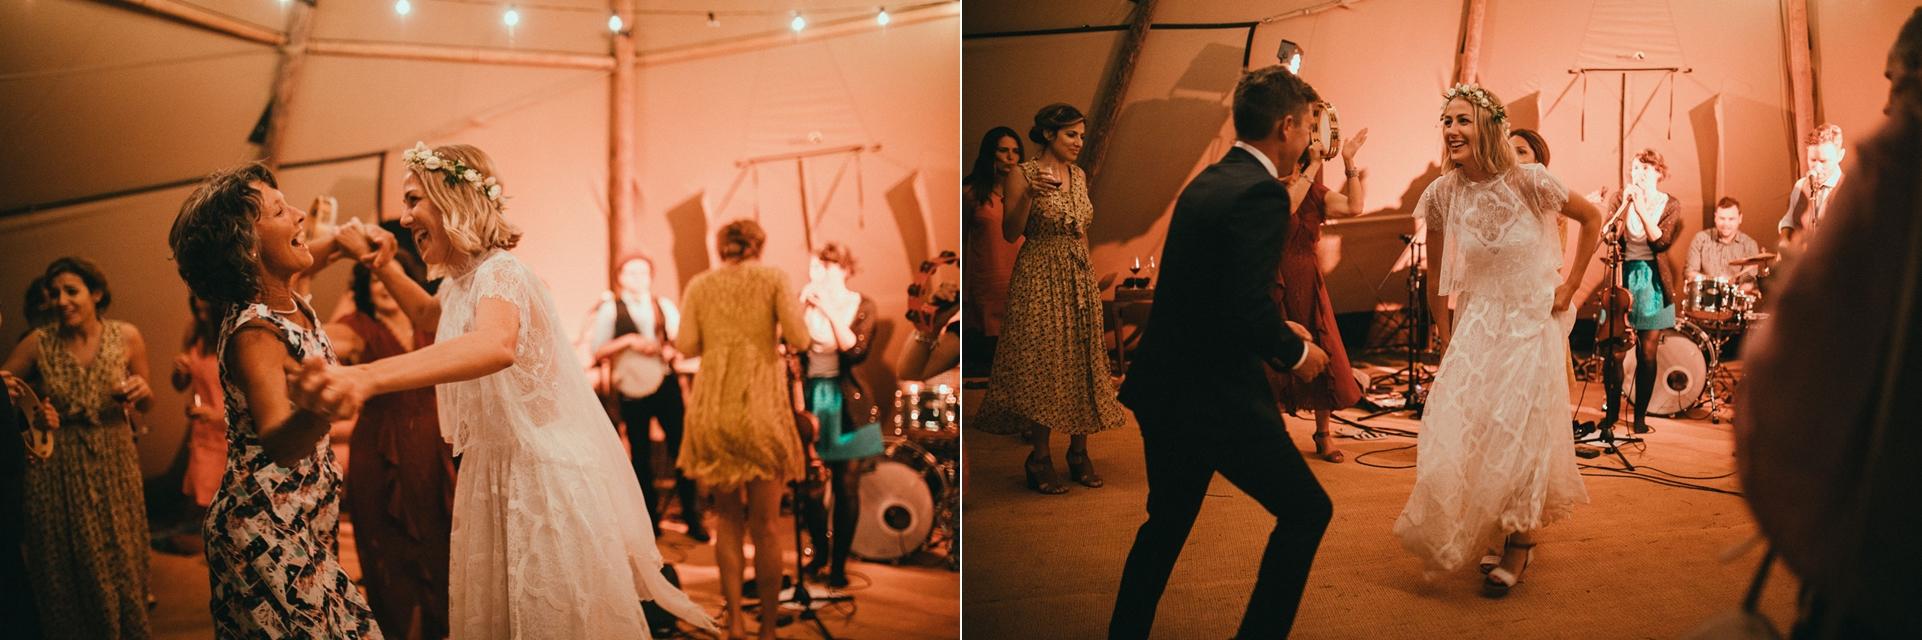 new-zealand-parihoa-wedding-photographer (101).jpg